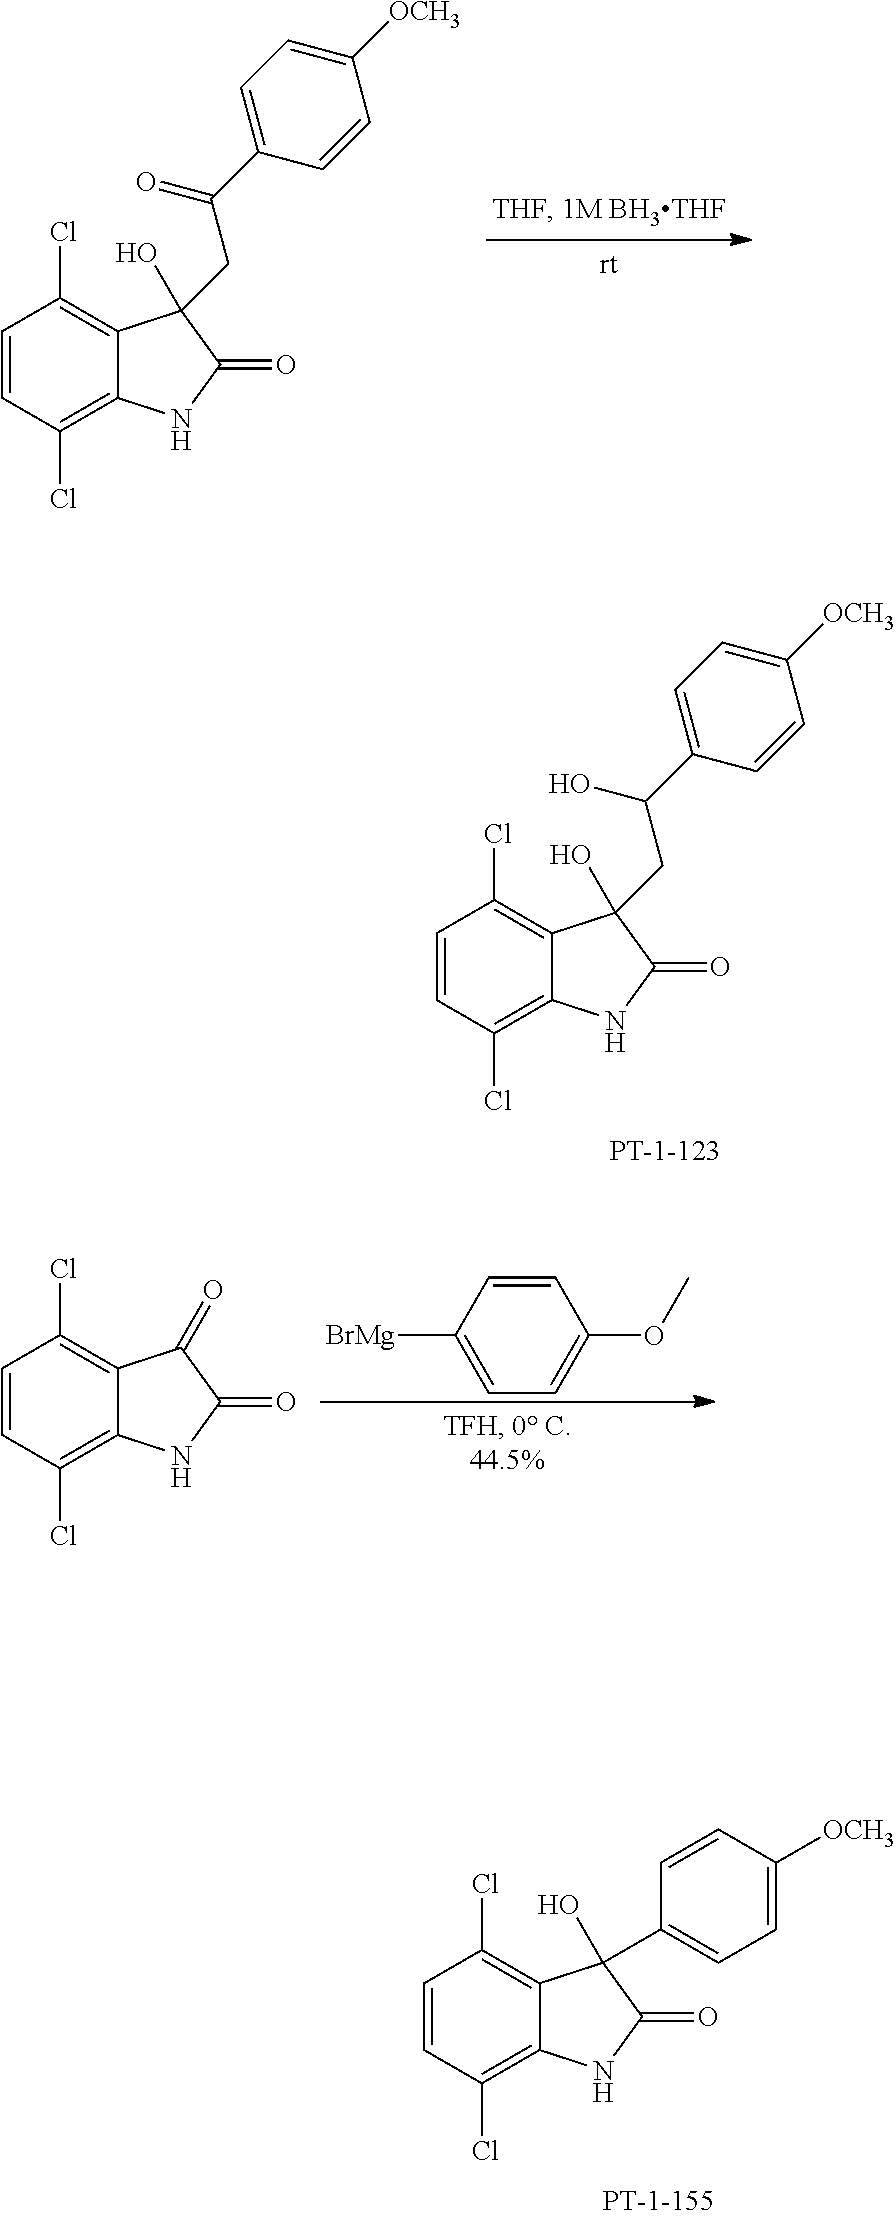 Sample Report Filter 14041 Patents Patentinspiration Microlab M 280 Circuit Diagram Example 4